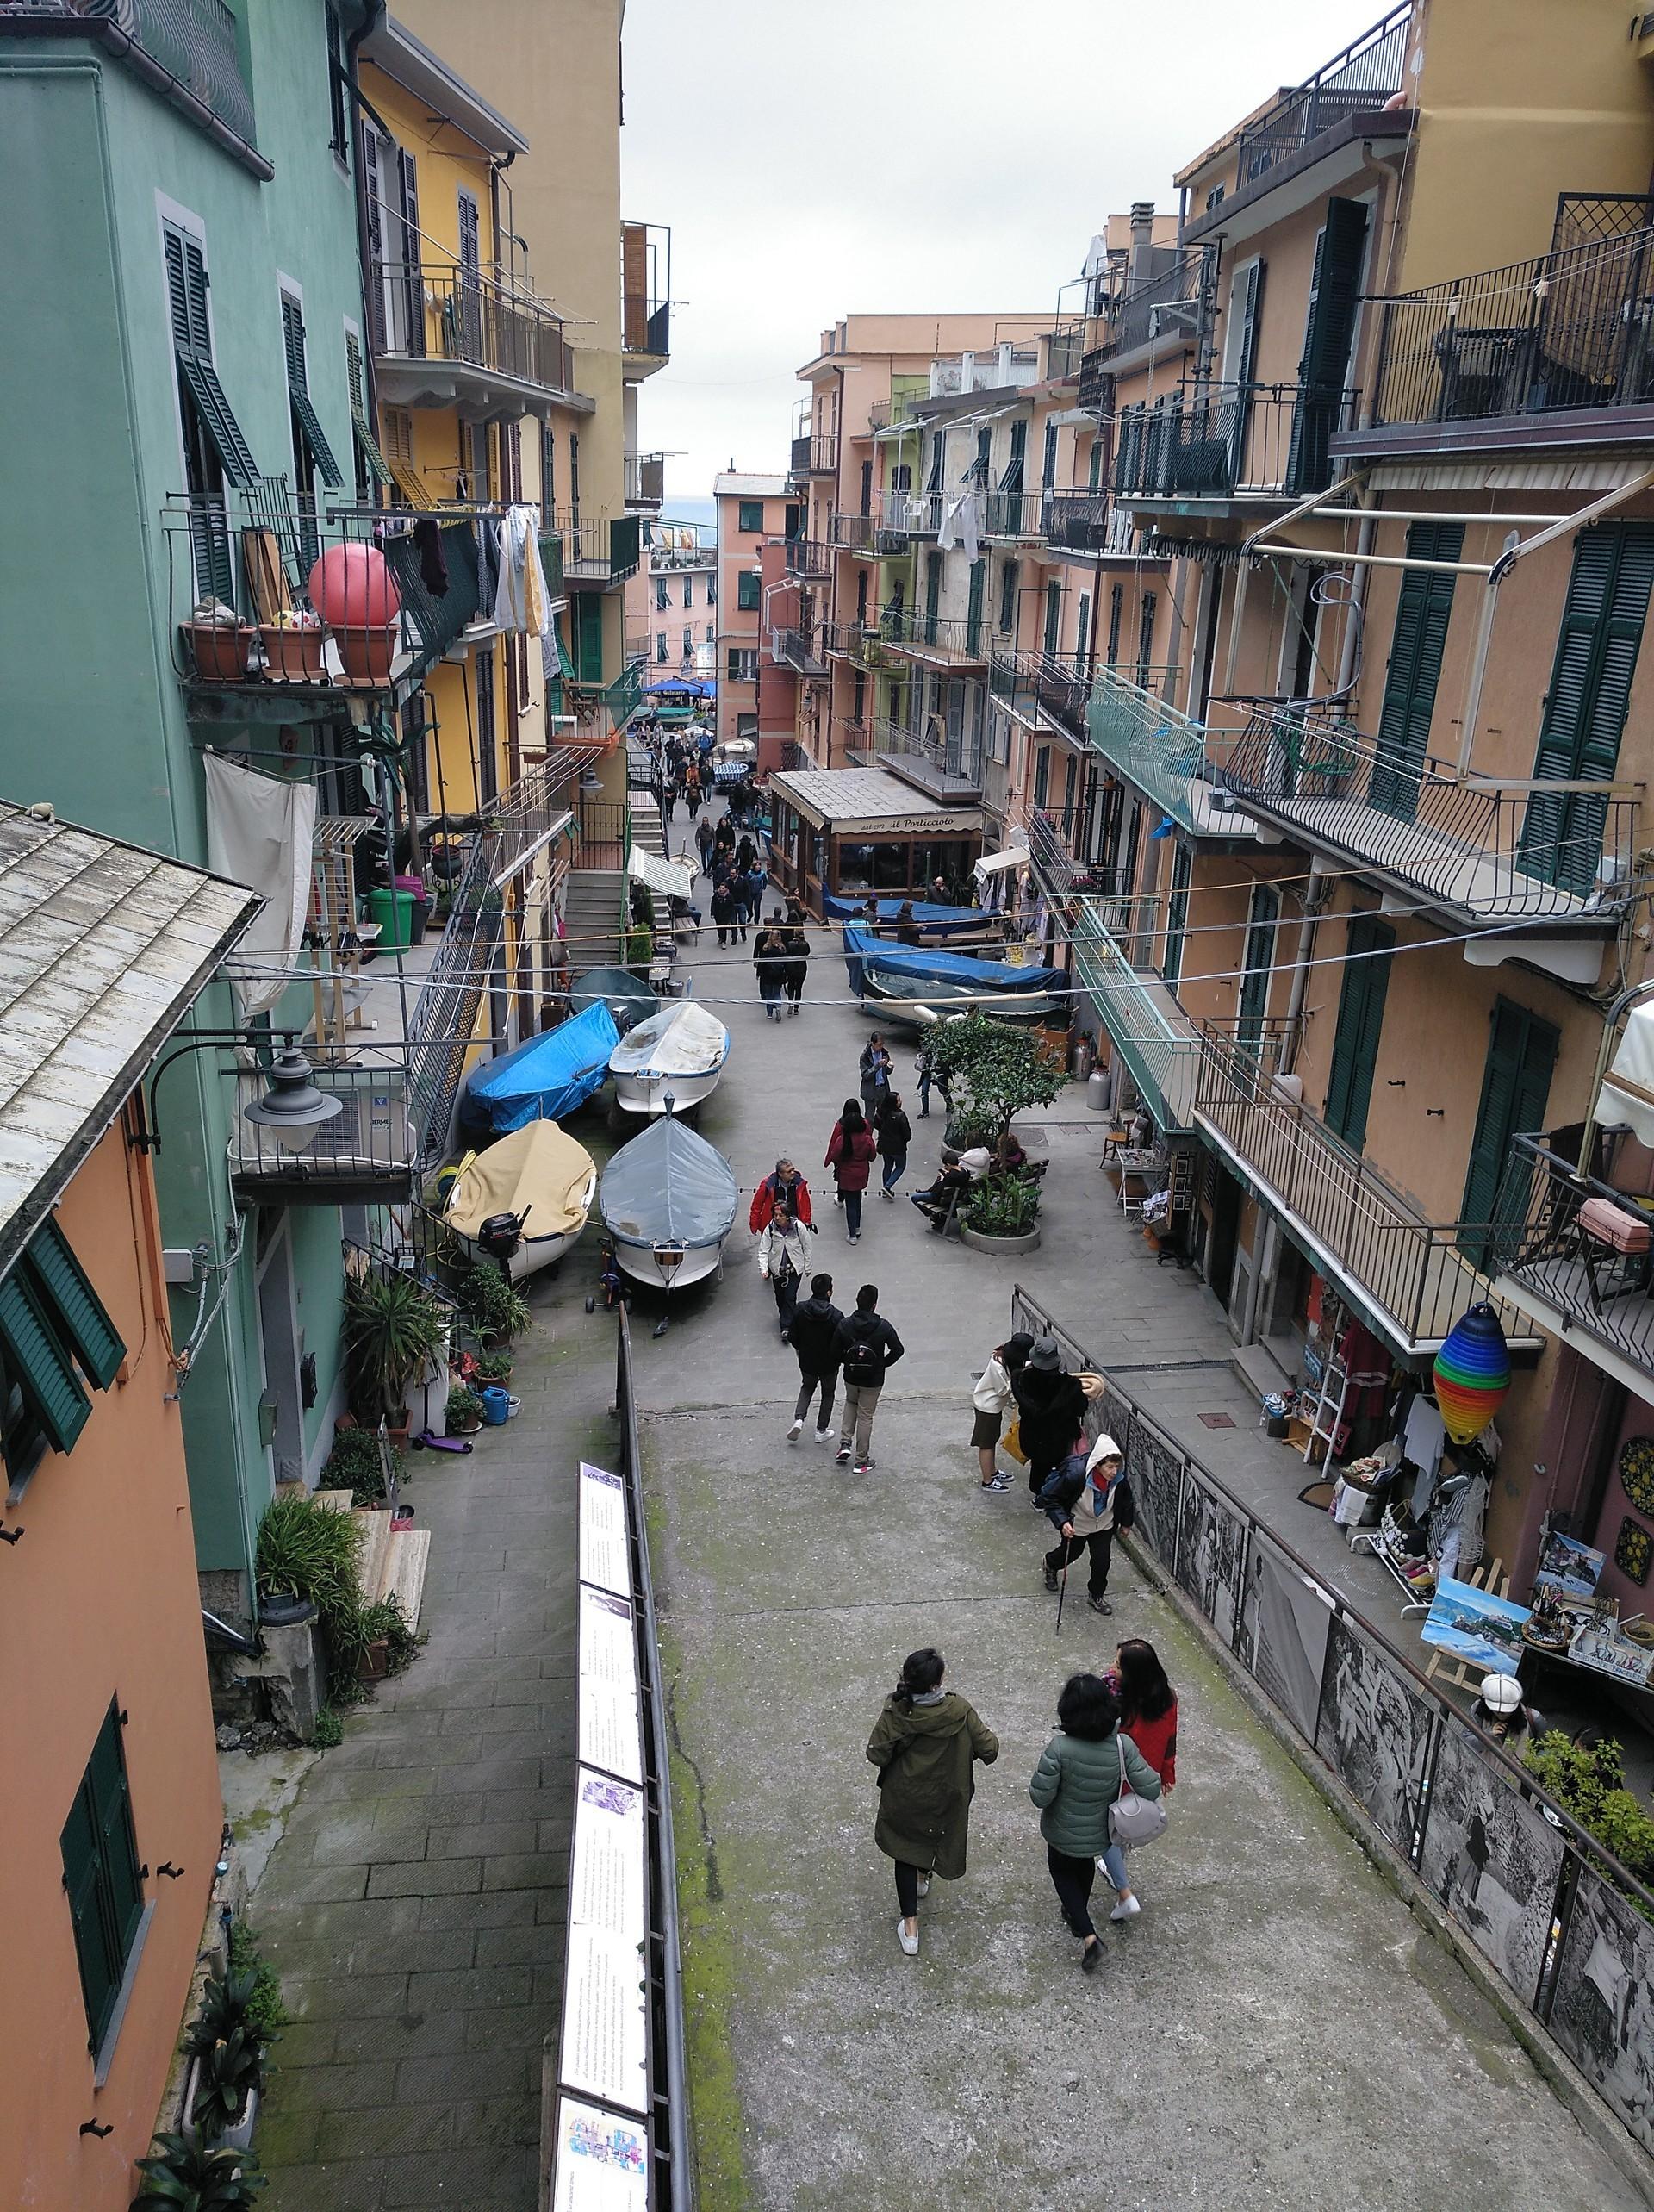 la-joyita-italiana-cinque-terre-4cc42fd5